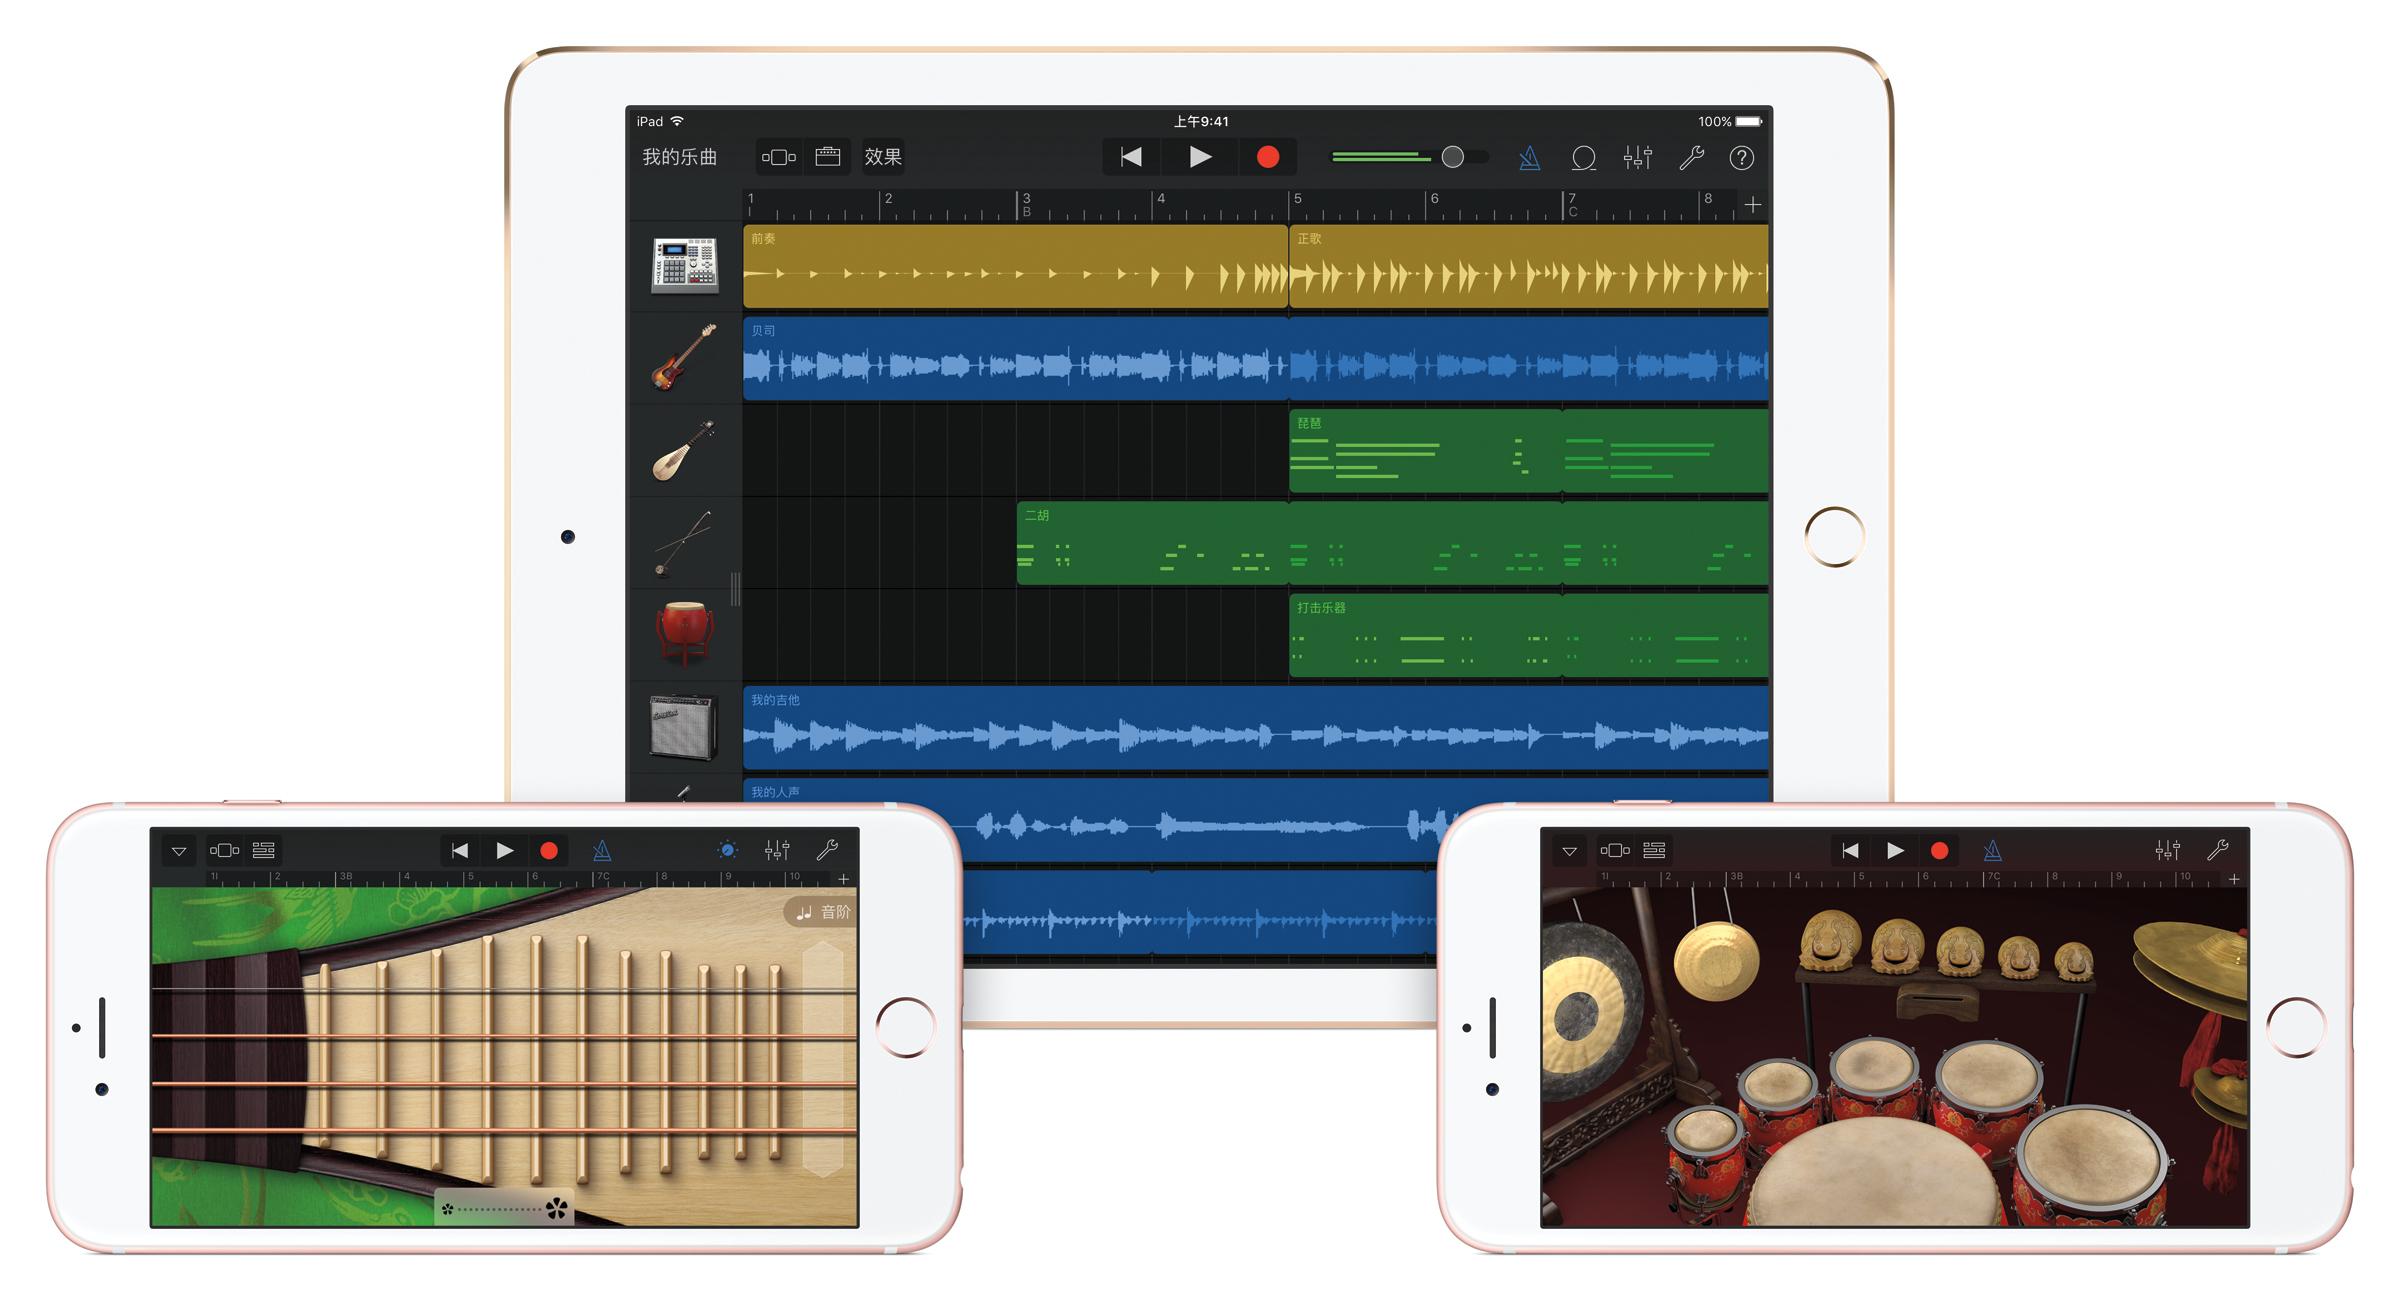 Apple Celebrates Chinese Music with GarageBand Update